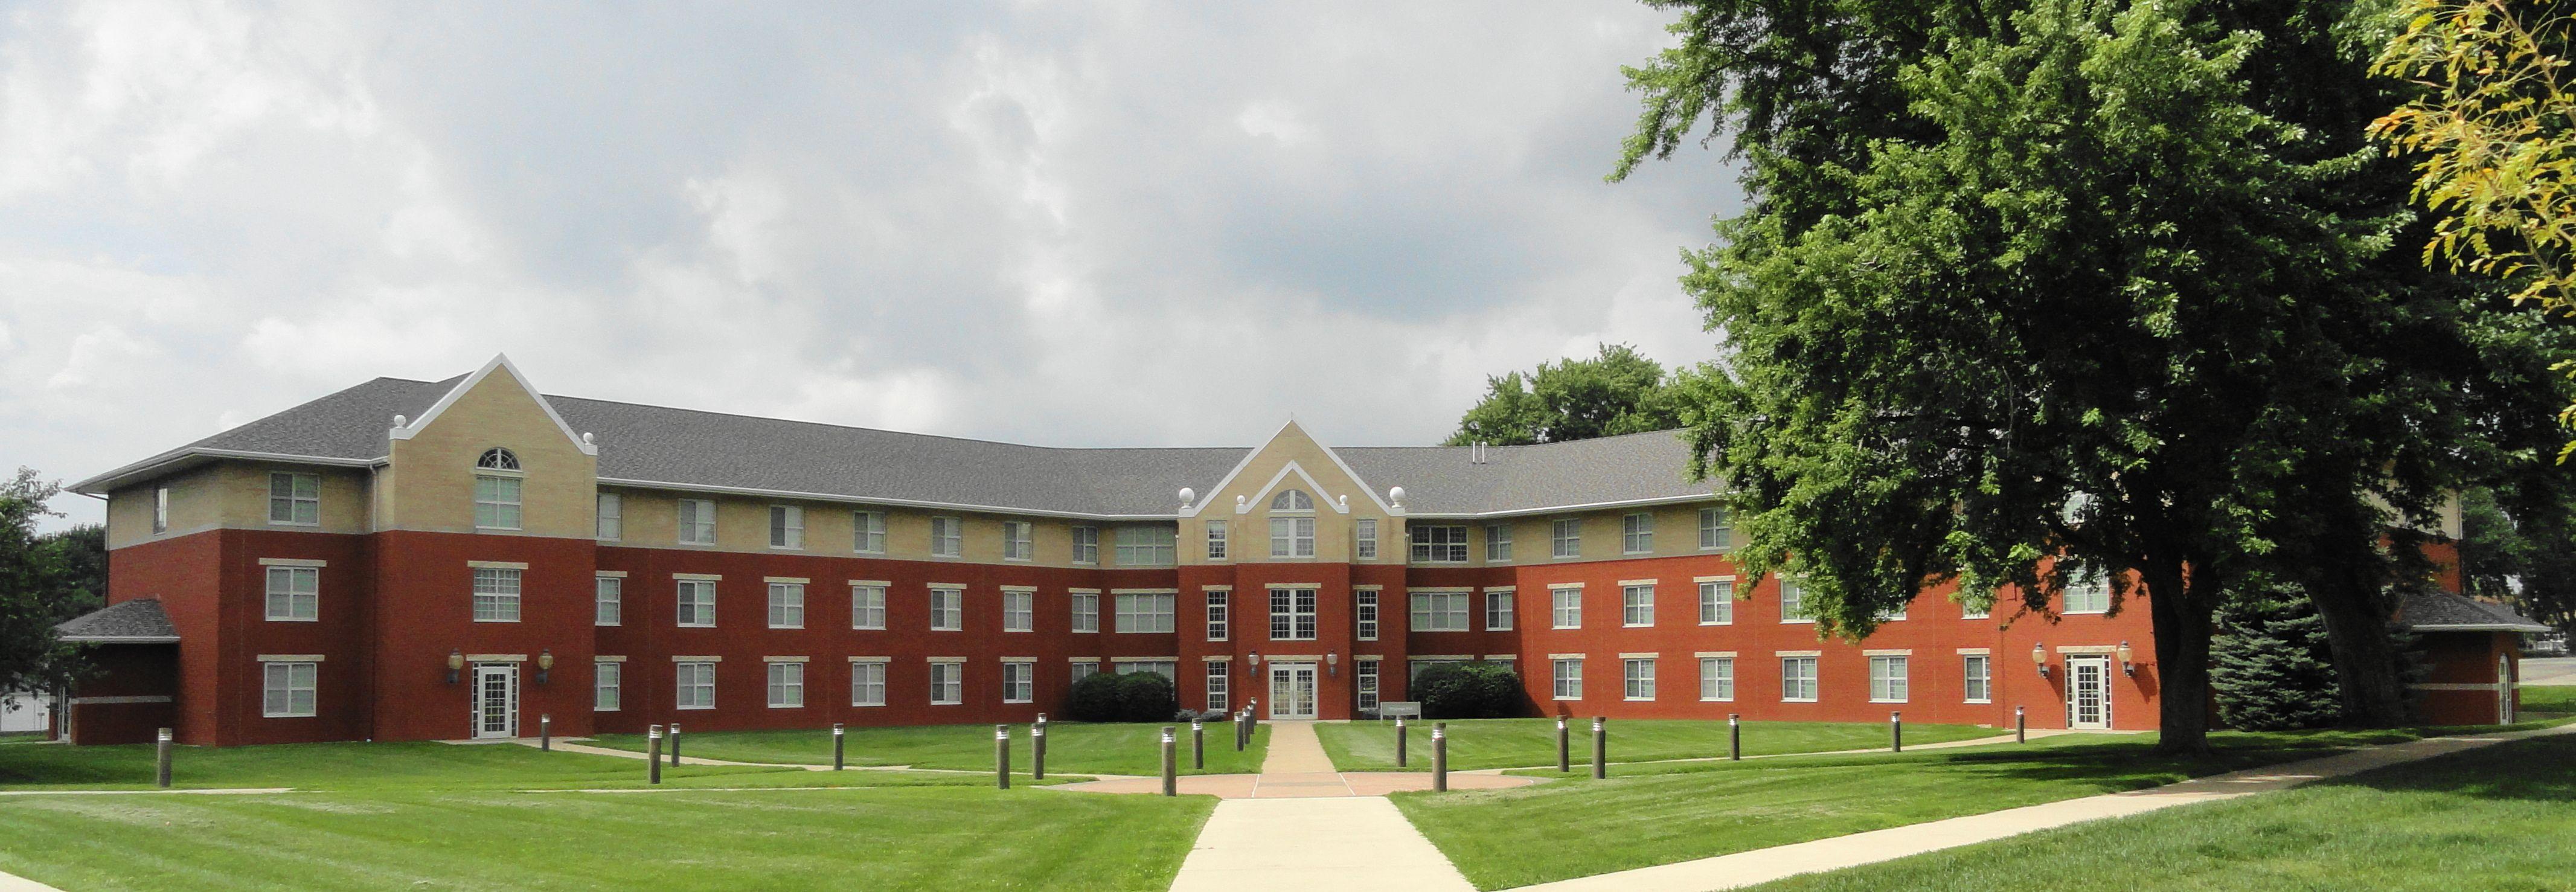 Prairie state college